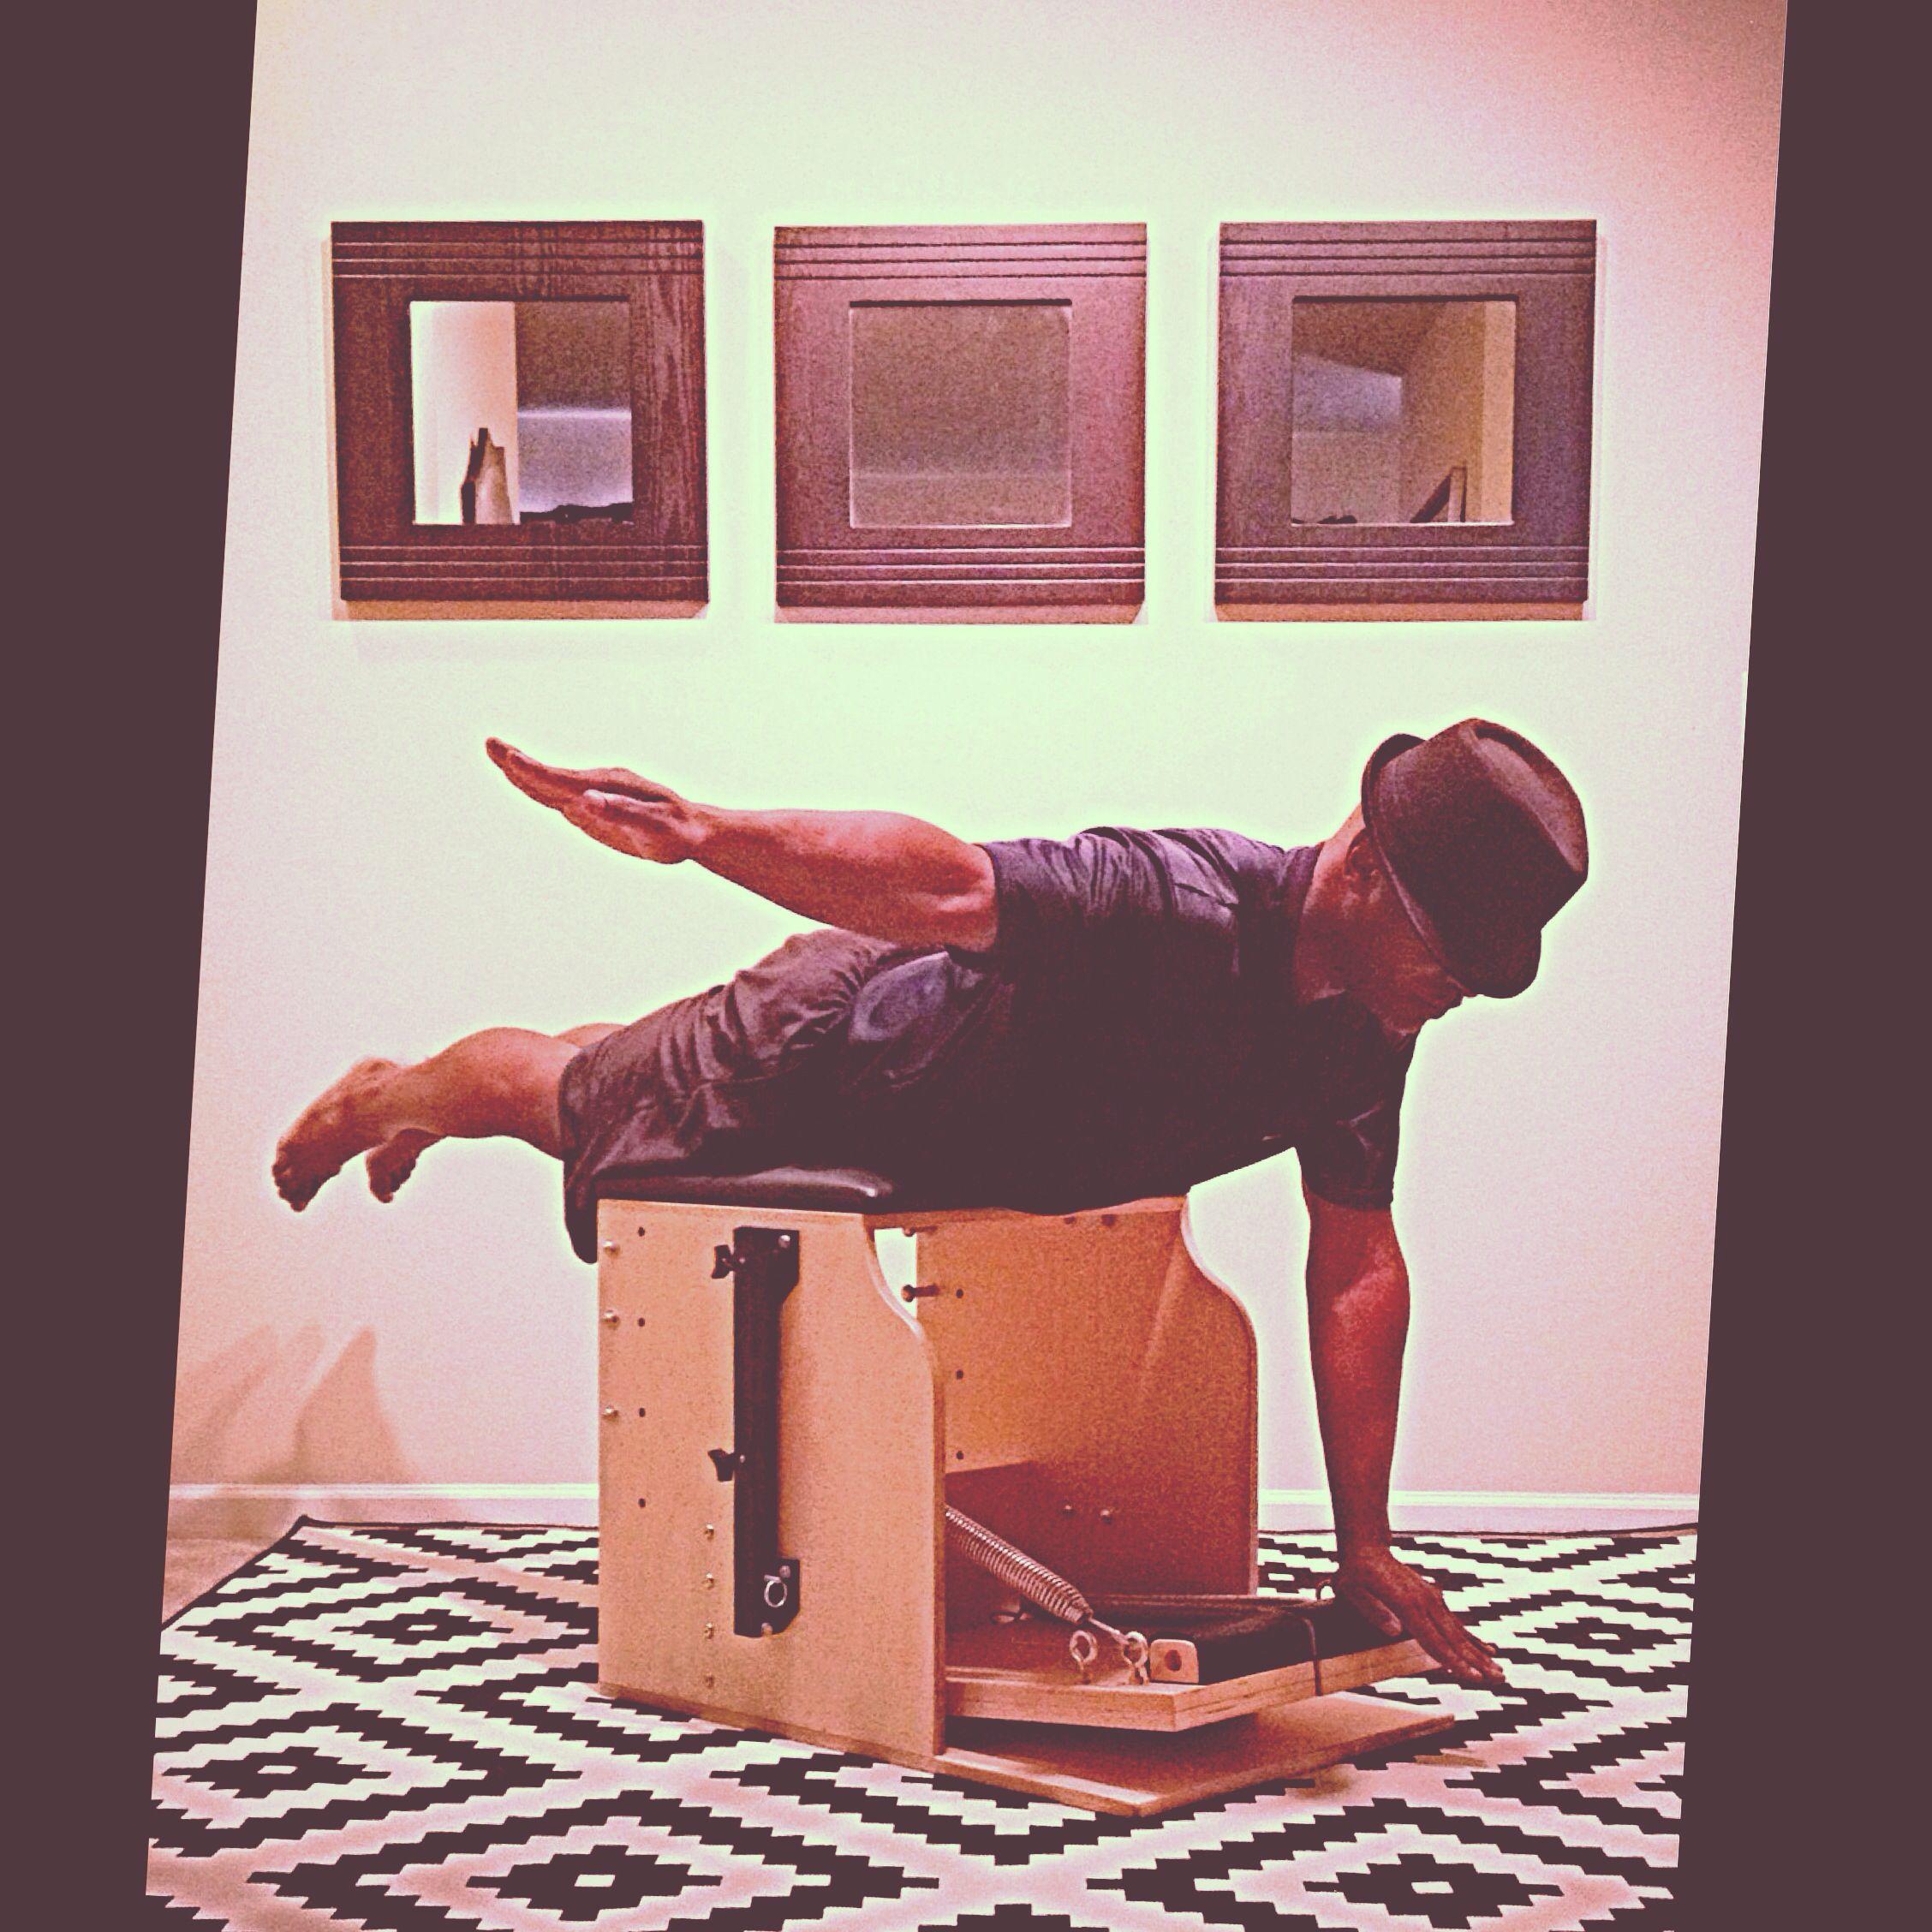 MidNight @PilatesDwell_Canton   Low Chair Exercise: Pumping One Arm #latenightworkout #armstrength #weakstrongweak #combo • #pilates #pilatesstudio #pilatesinstructor #pilatesformen #contrology #classicalpilates #calisthenics #gymnastics #fitness #yoga #personaltrainer #menshealth #fedora